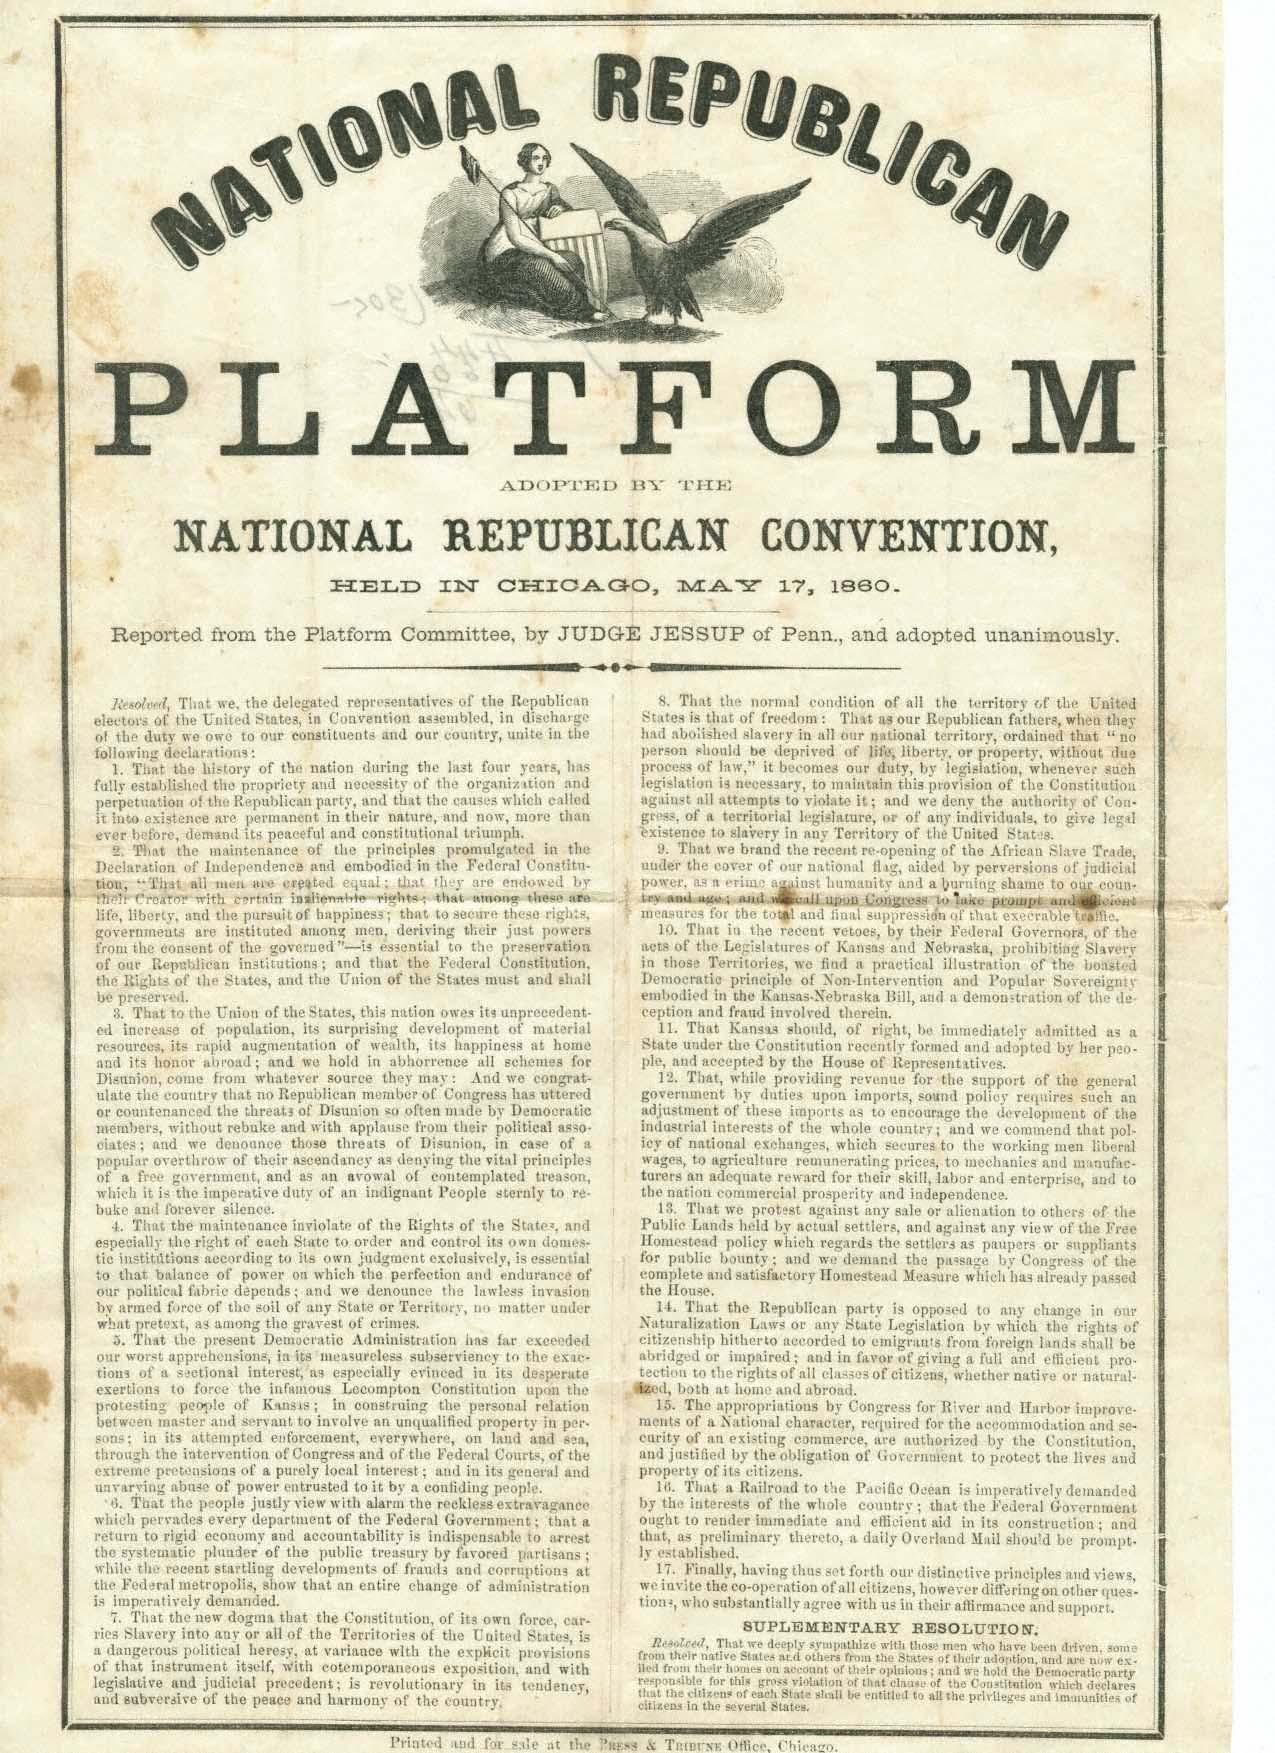 Republican National Platform, 1860